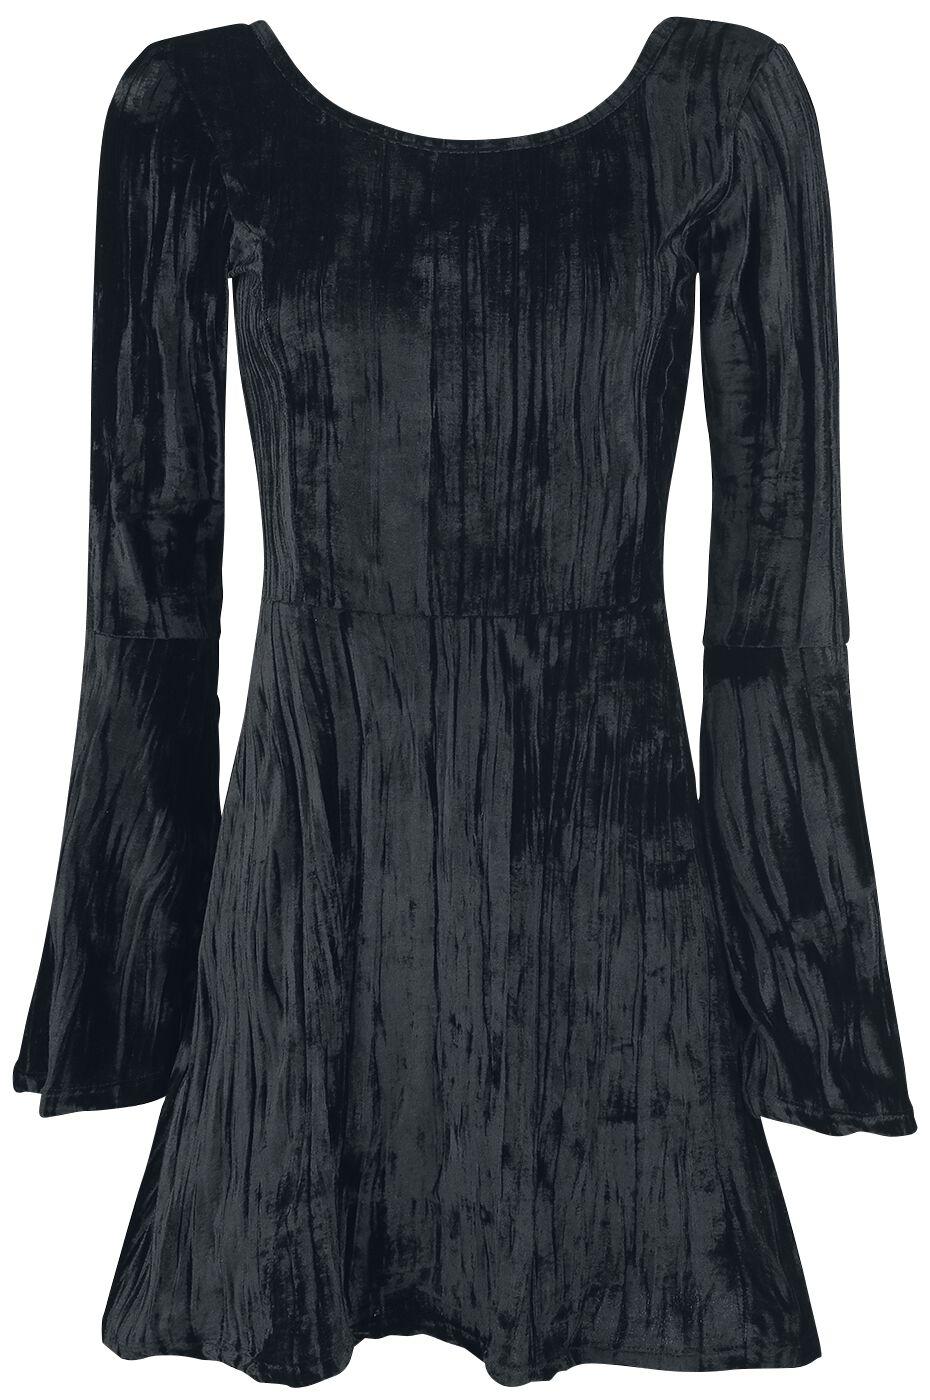 Image of   Outer Vision Noci Black Velvet Kjole sort